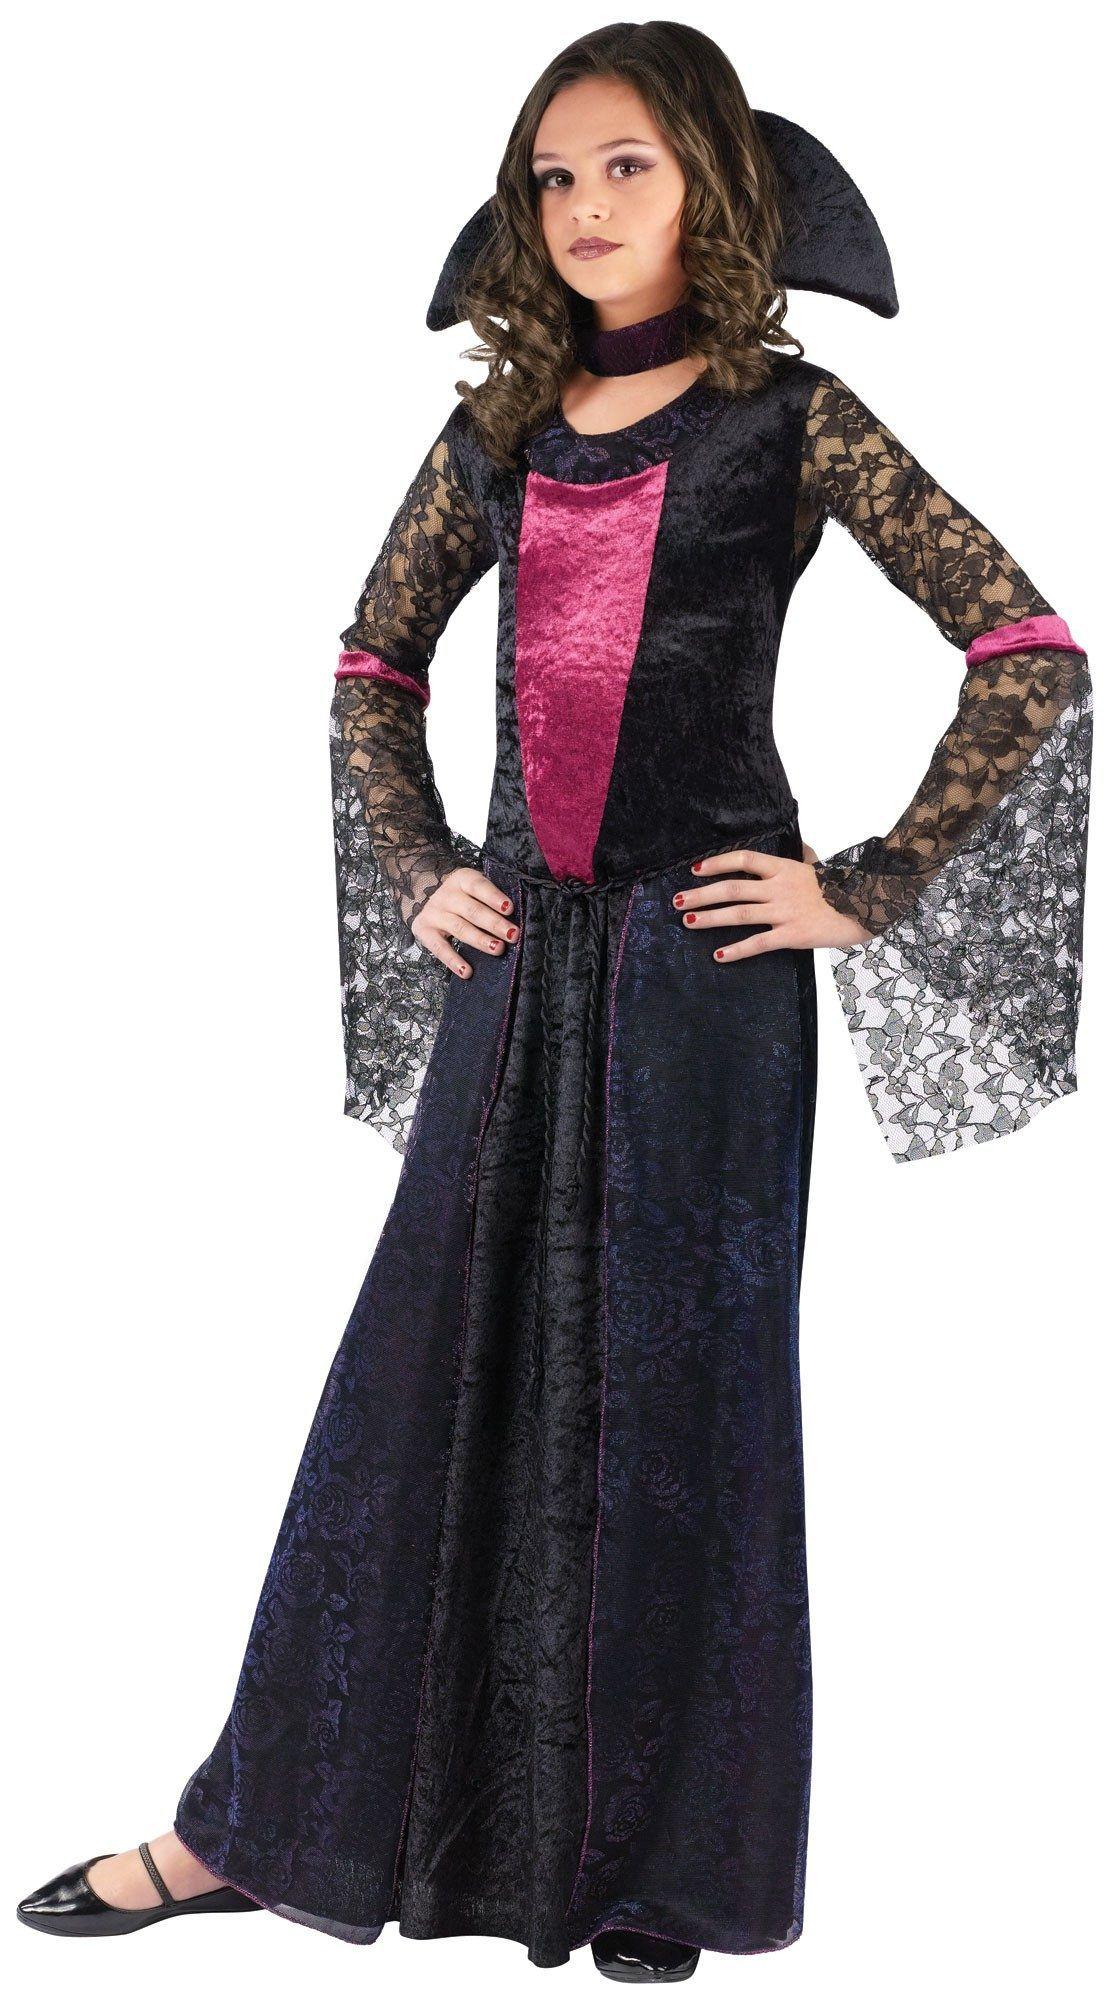 Child Vampire Countess Bloodthorne Costume Halloween Horror Girls Fancy Dress